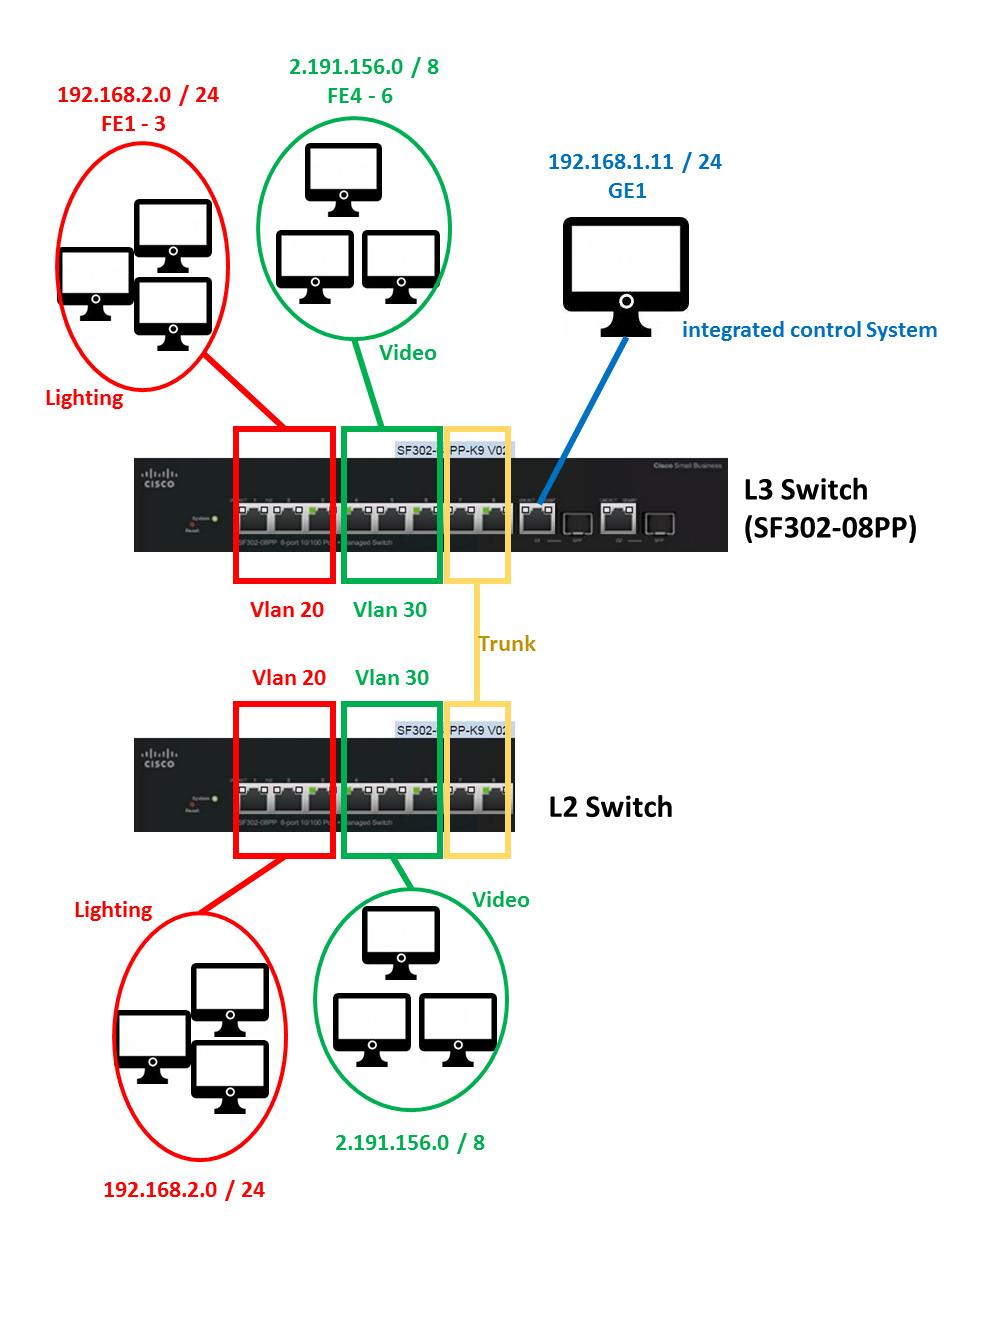 Intervlan network_system